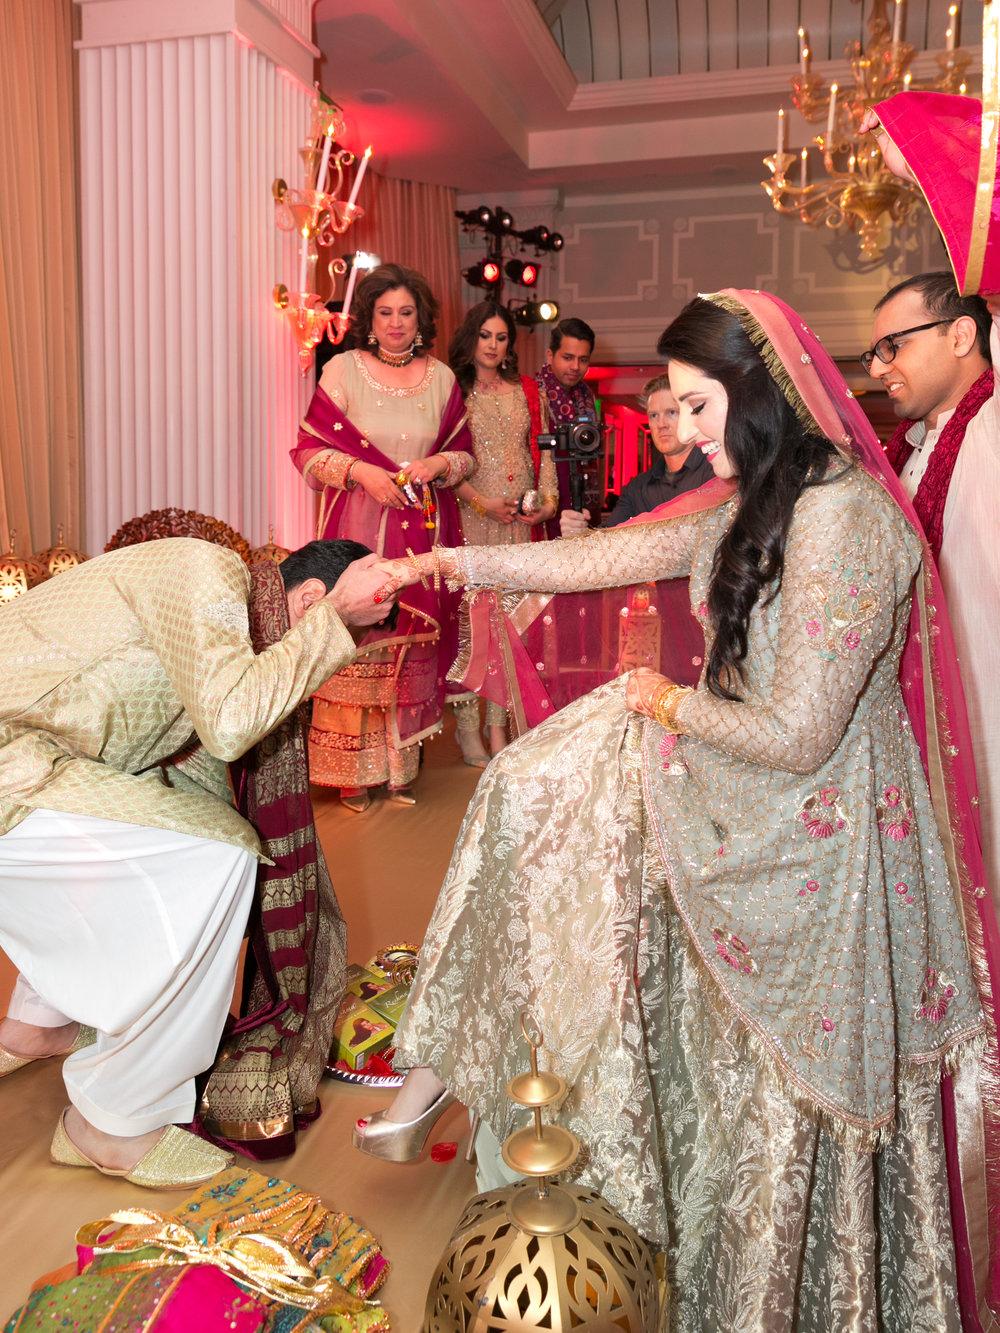 Pakistani_bride_zara_kamal_beverly_hills_zara_shahjahan_styled_by_sabaa_kamal_traditional_elan_sabysachi_mehndi_entrance.jpg